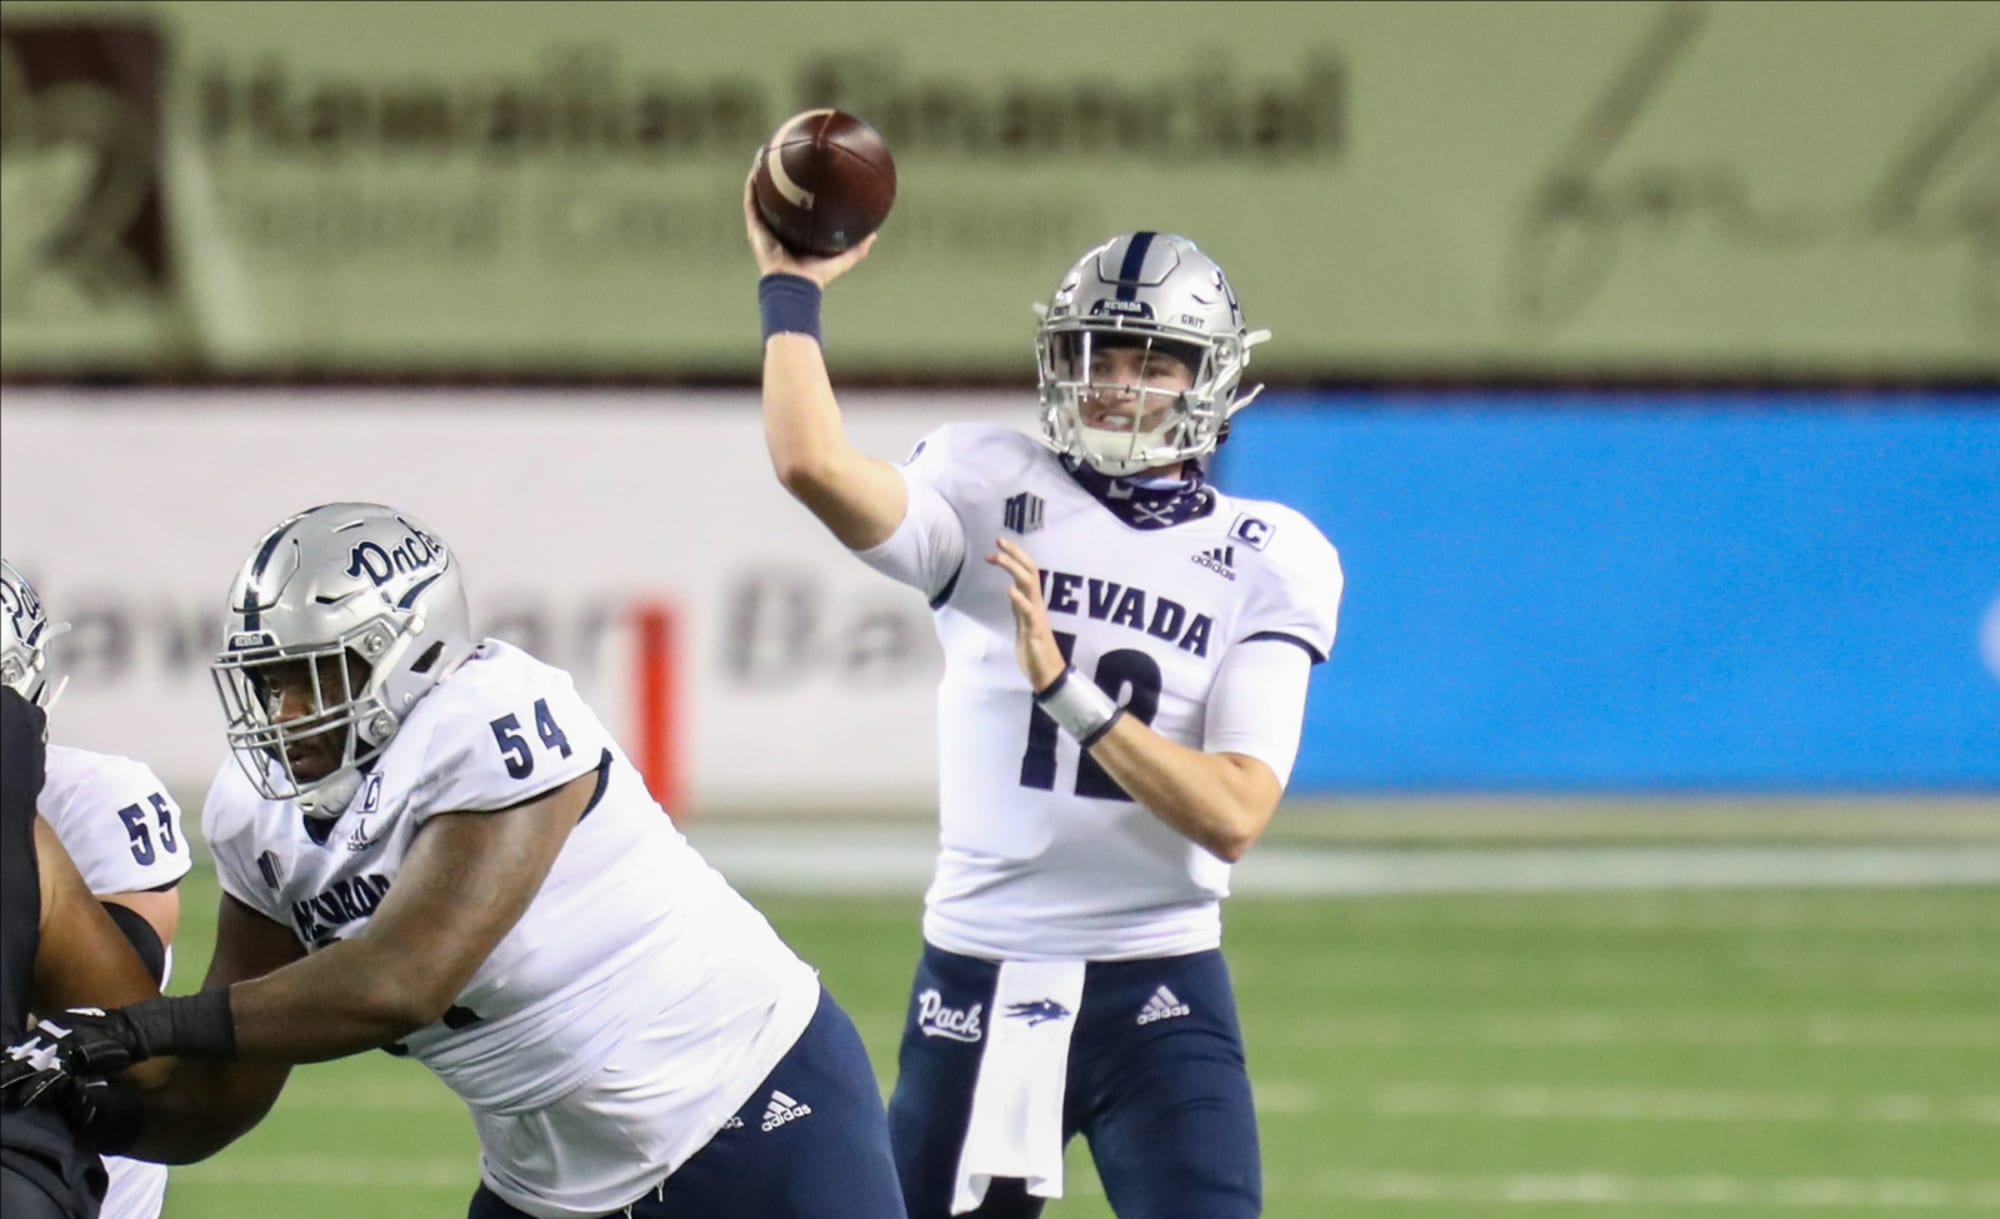 2022 NFL Draft: Nevada QB Carson Strong the dark horse for QB1